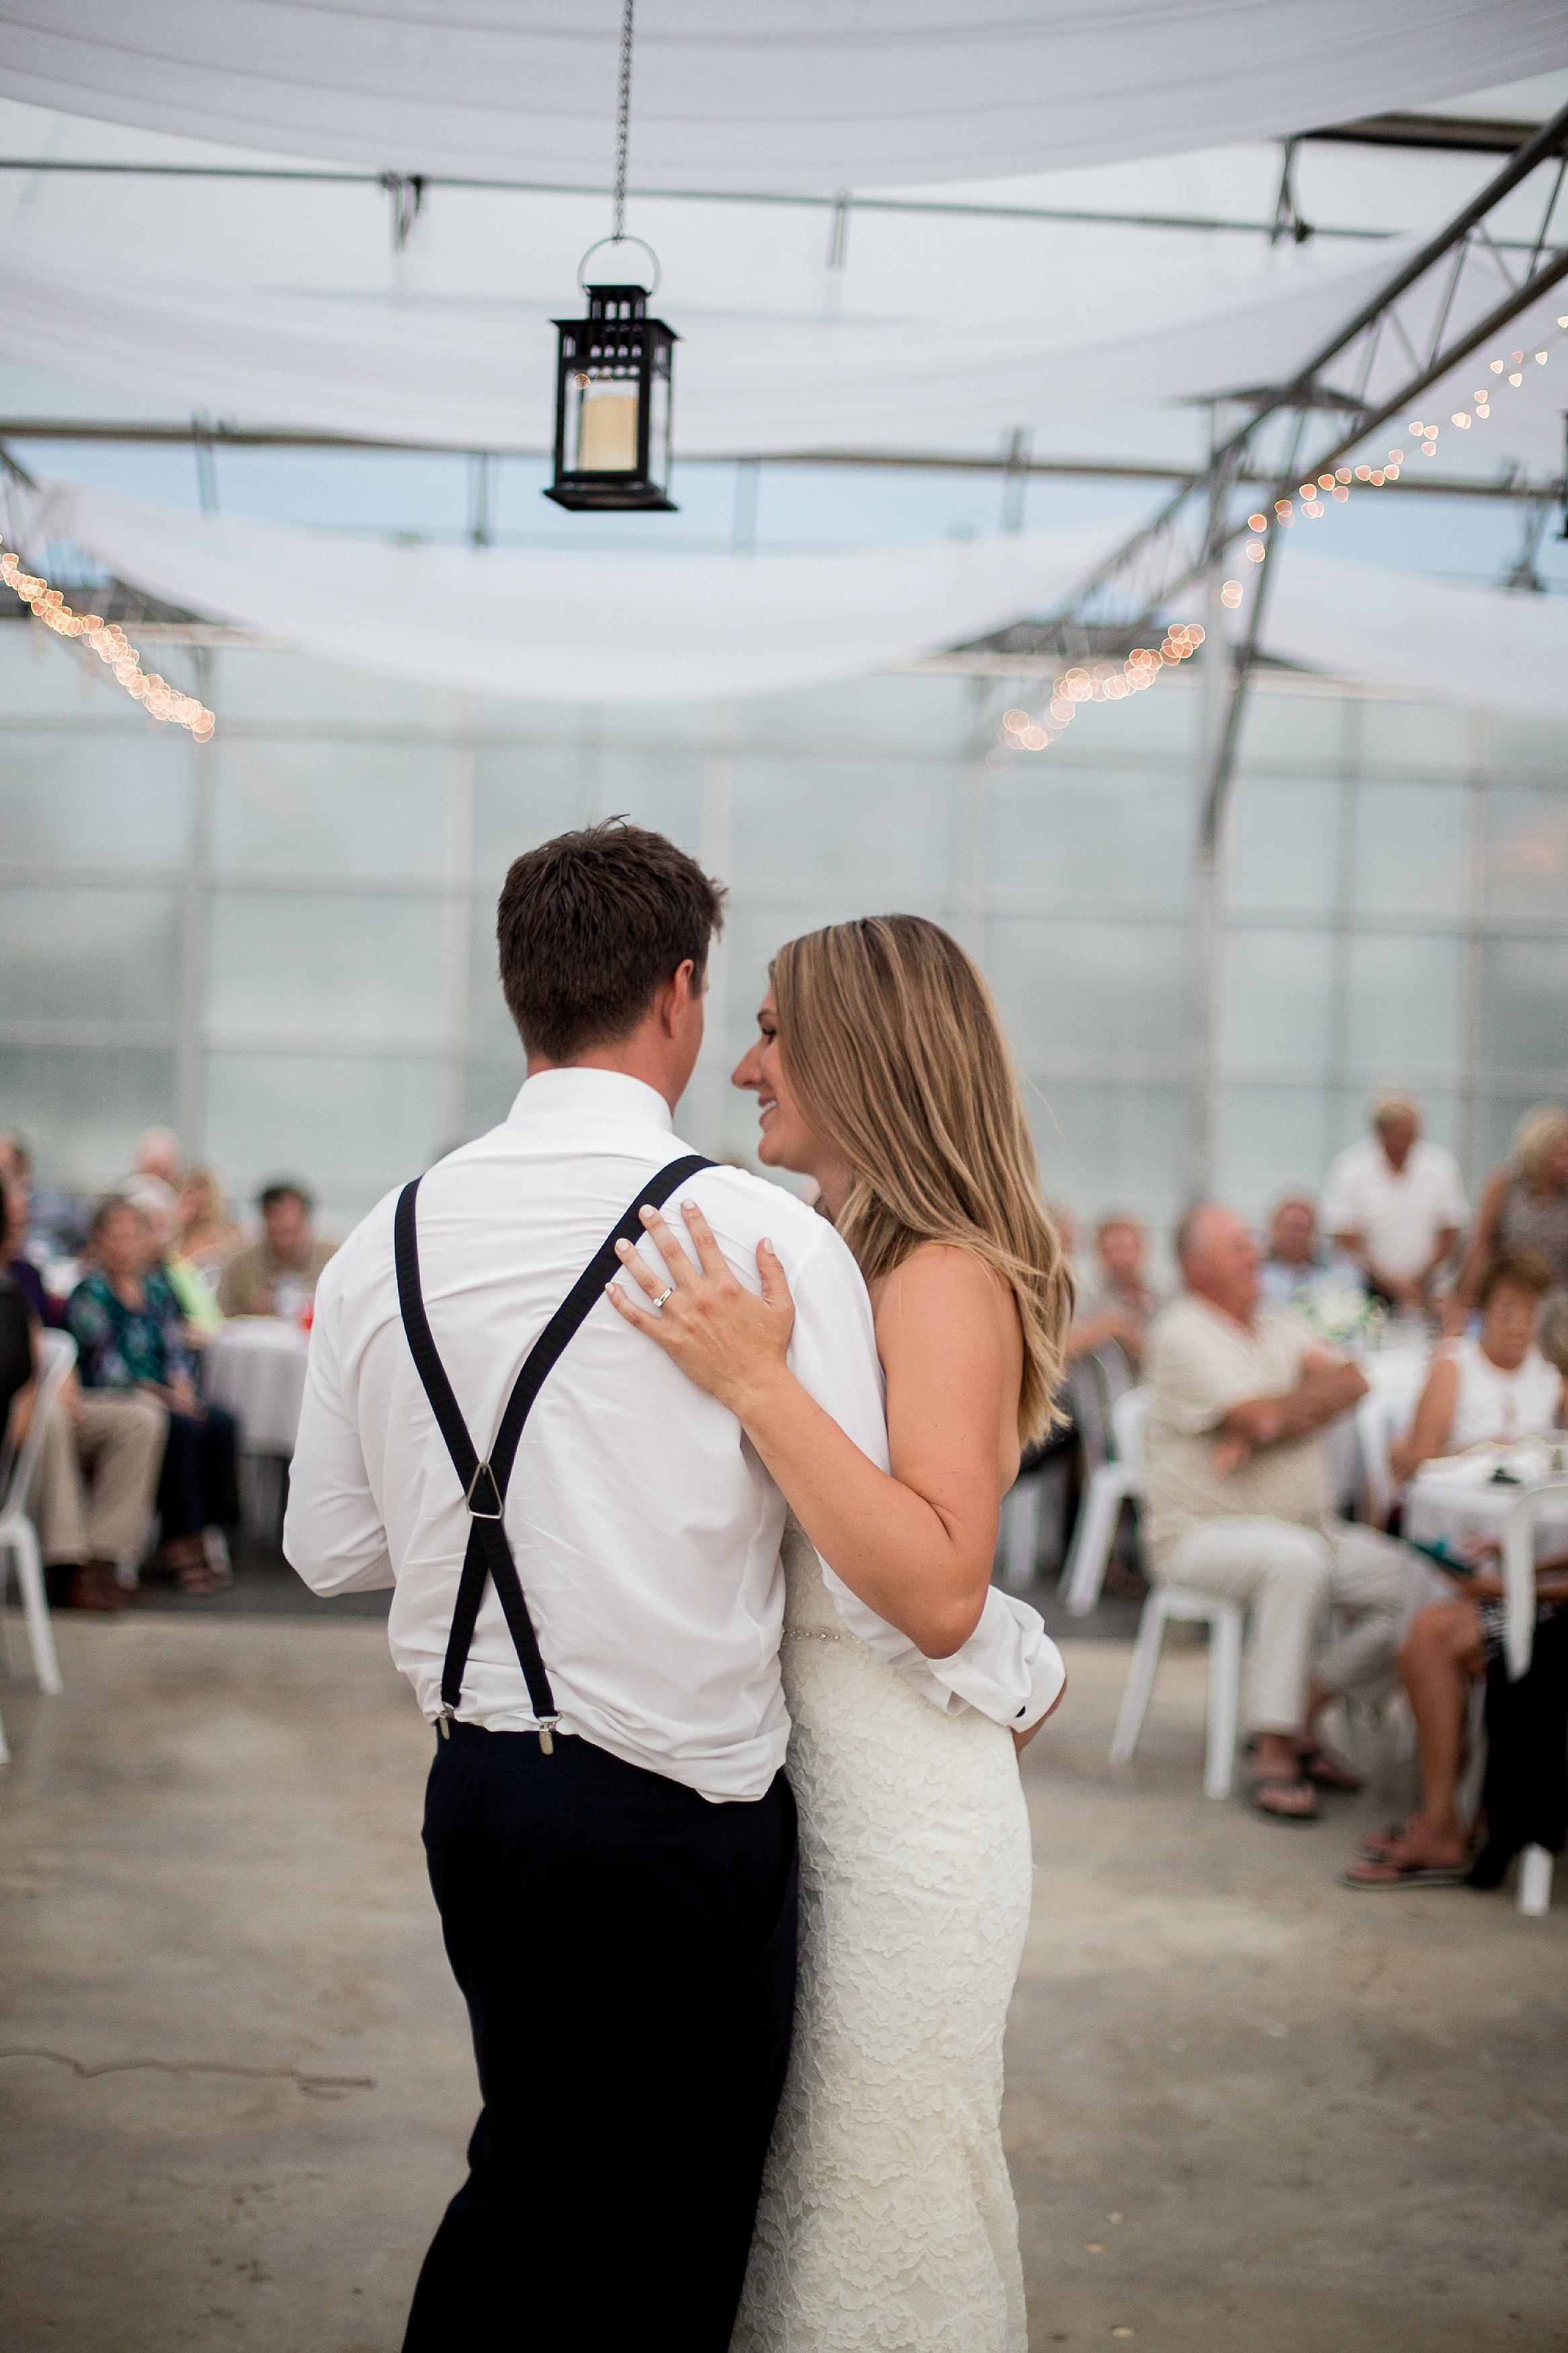 Greenhouse wedding reception   First dance photos   Keila Marie Photography   Vancouver Wedding Photographer